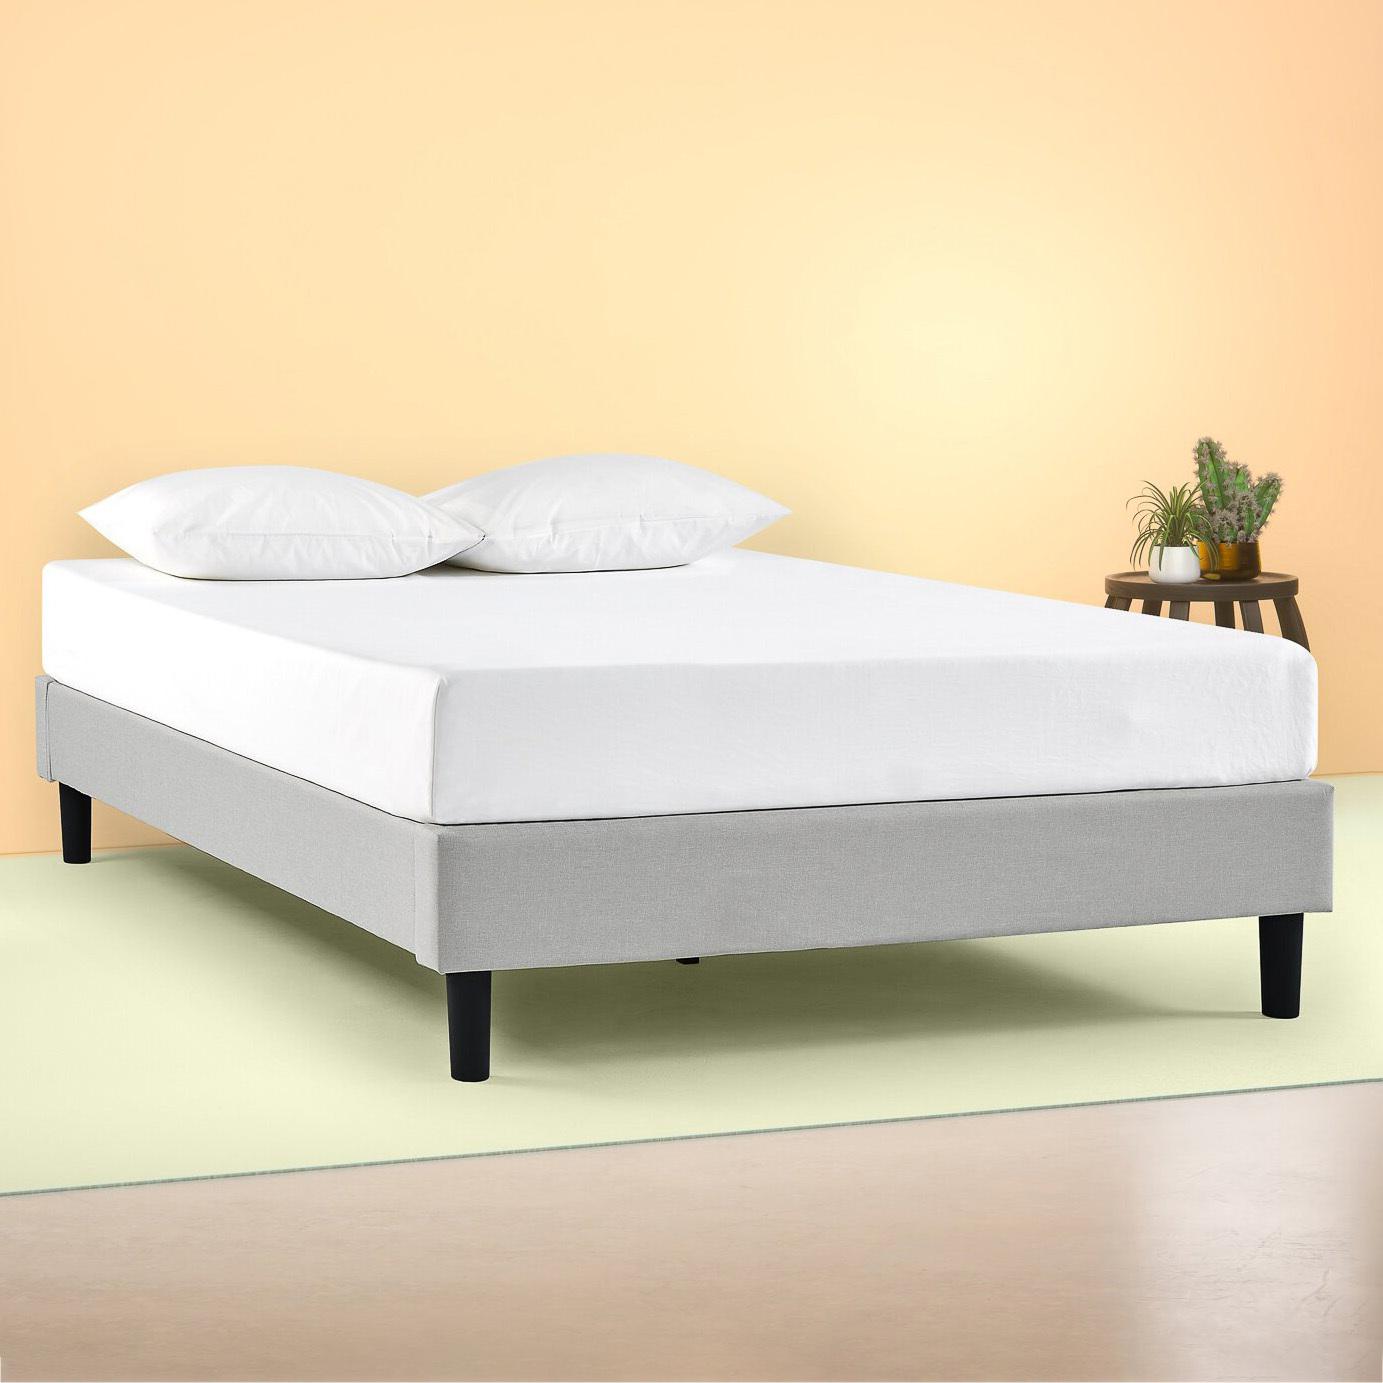 Studio Home Light Grey Cameron Upholstered Bed Base Reviews Temple Webster